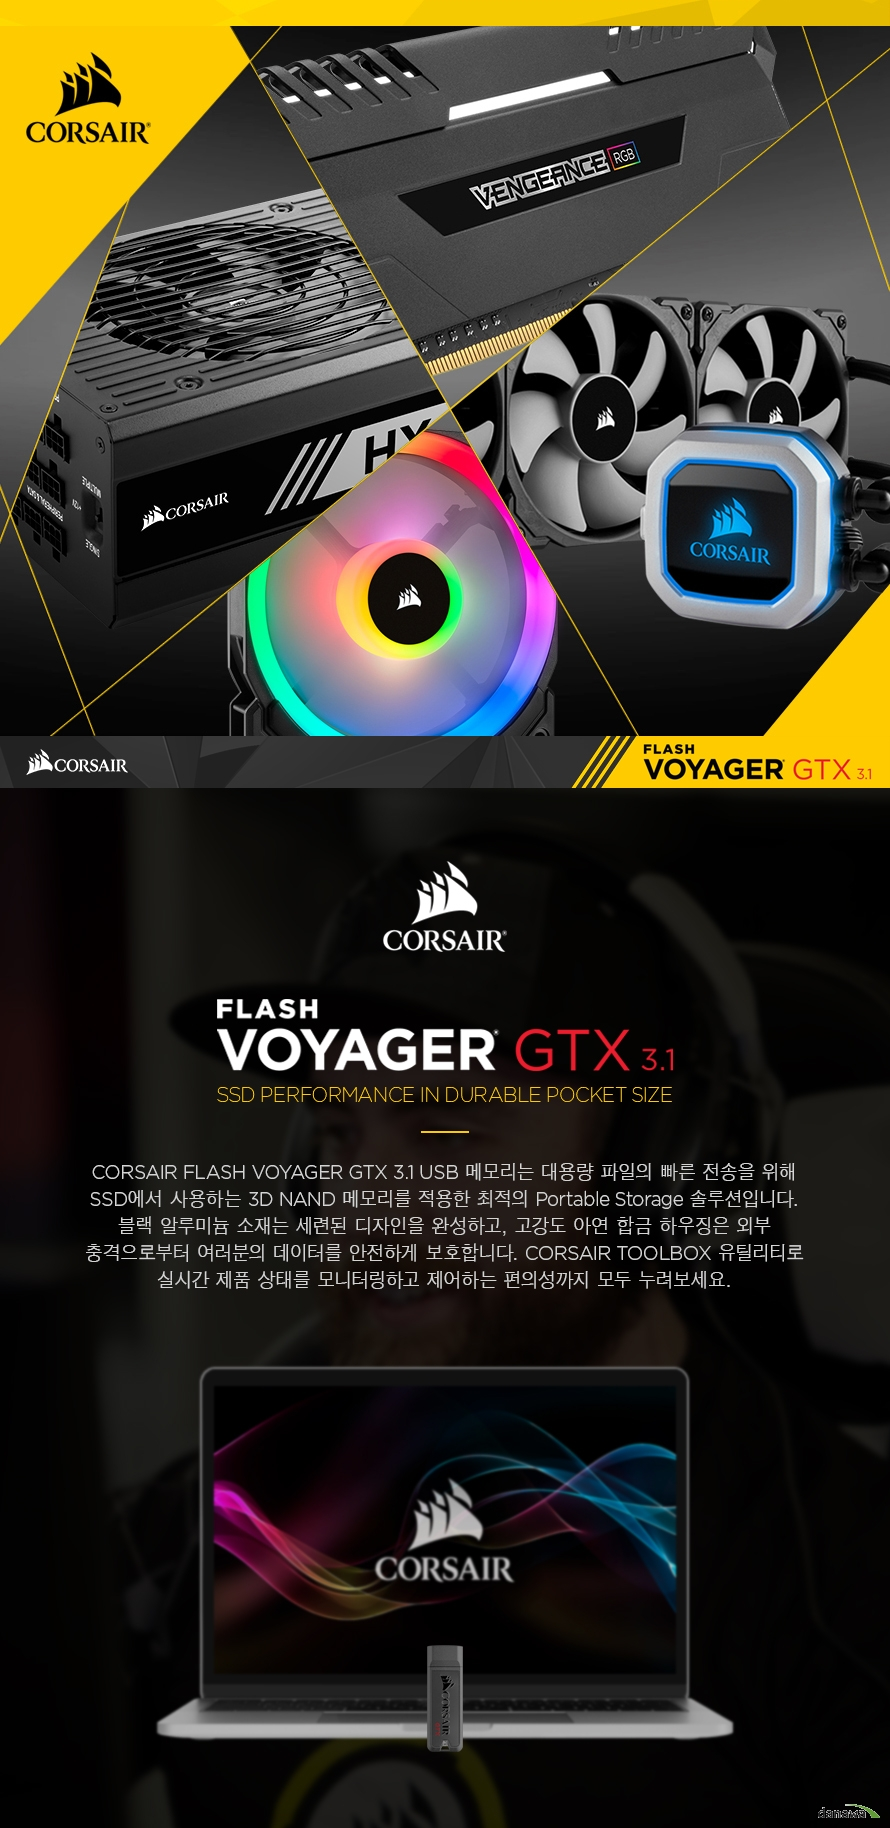 CORSAIR UFD Flash Voyager GTX 3.1 메모리는 대용량 파일의 빠른 전송을 위해 SSD에서 사용하는 3D NAND 컨트롤러를 사용한 최적의 휴대용 저장장치 솔루션입니다. 블랙 알루미늄 소재로 고급스러움을 더하고 고강도 아연 합금 하우징의 외부 충격으로부터 여러분의 소중한 데이터를 안전하게 지켜줍니다.